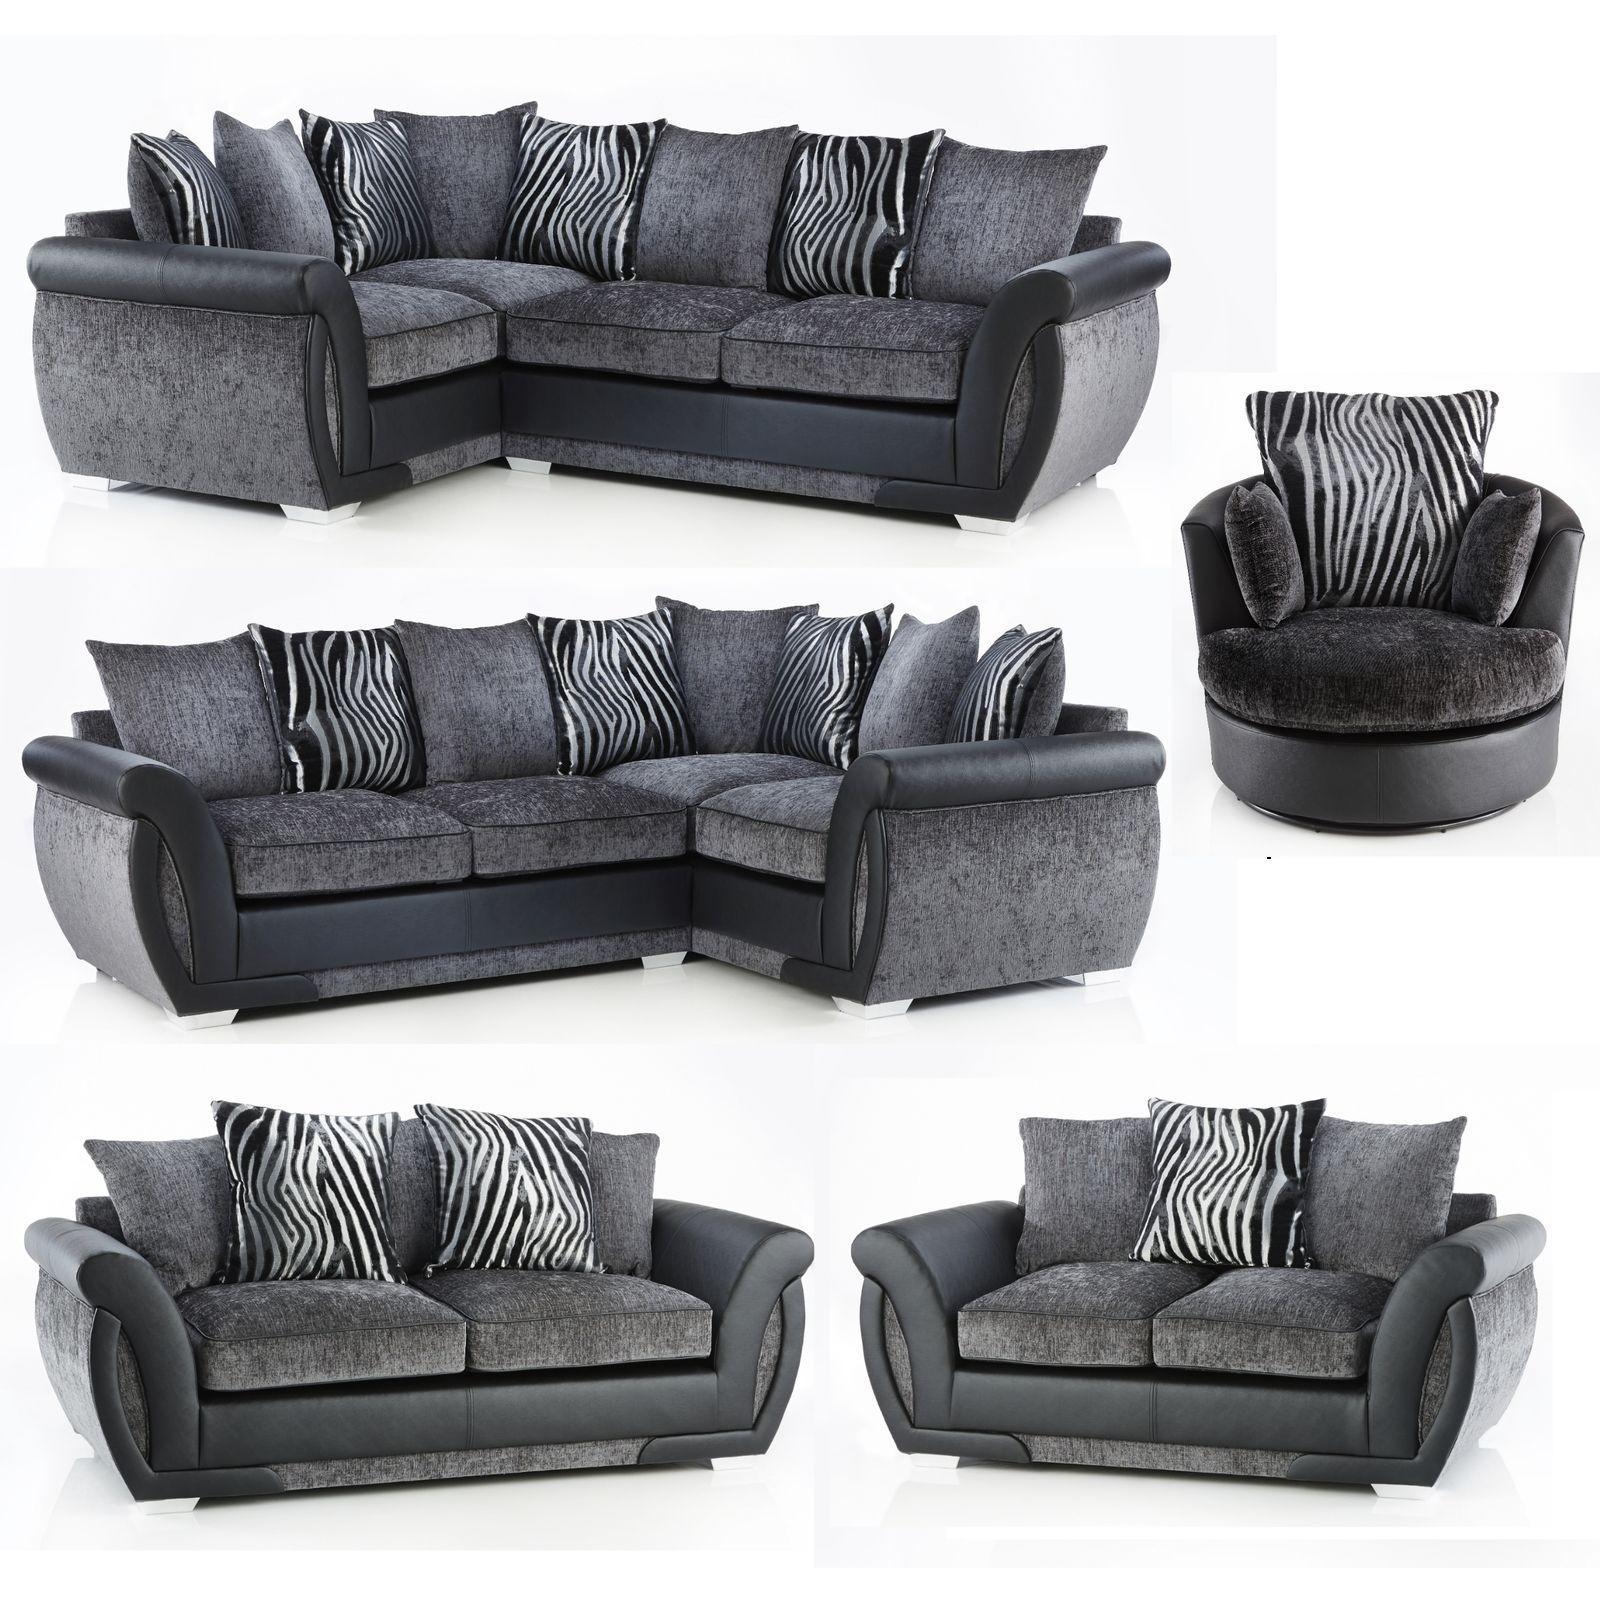 Lush Corner Sofa Or 3 + 2 Or Swivel Chair Black Grey Inside Corner Sofa And Swivel Chairs (View 3 of 20)